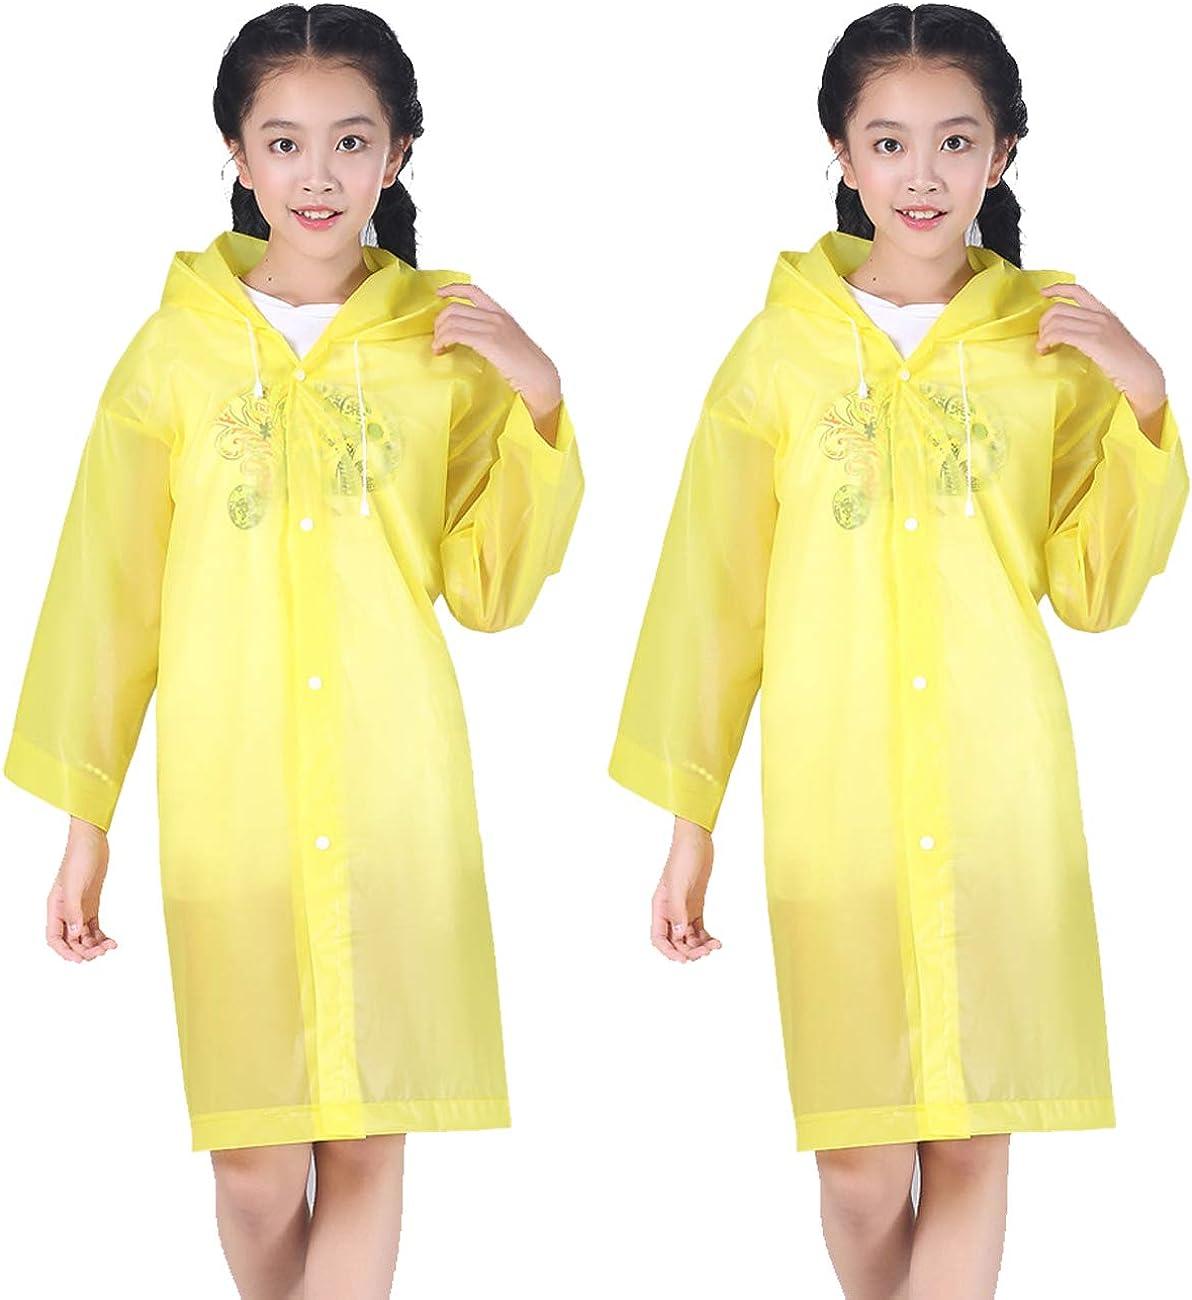 TIHOOD 2PCS Kids Rain Ponchos Reusable Raincoats Portable Rain Wear with Hat Hood Unisex for 6-12 Years Old Children